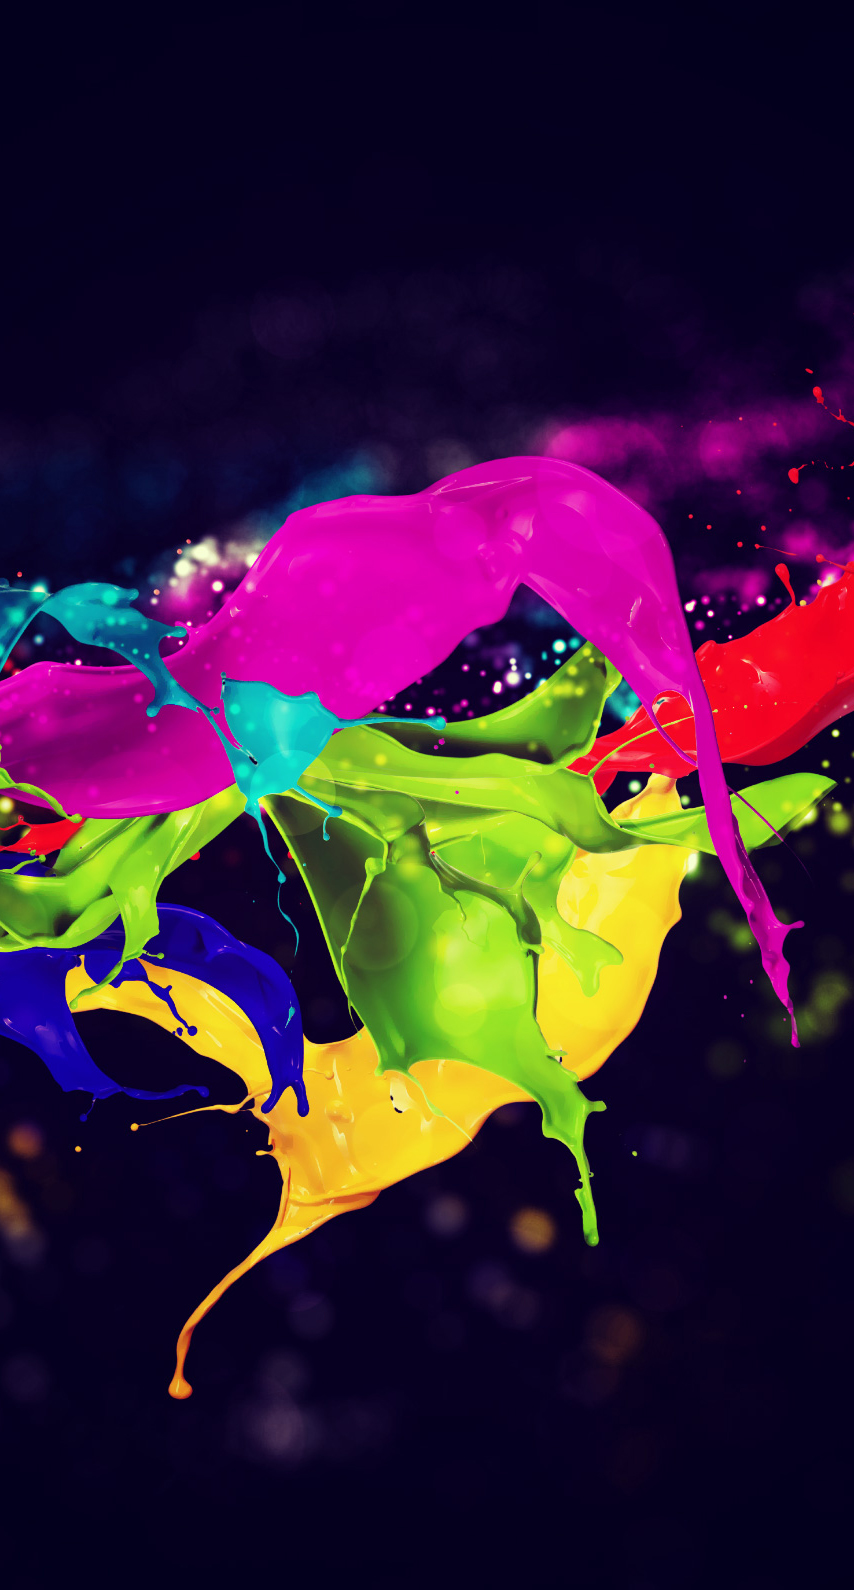 rainbow, fun, leaf, drop, splash, abstract, light, bright, celebration